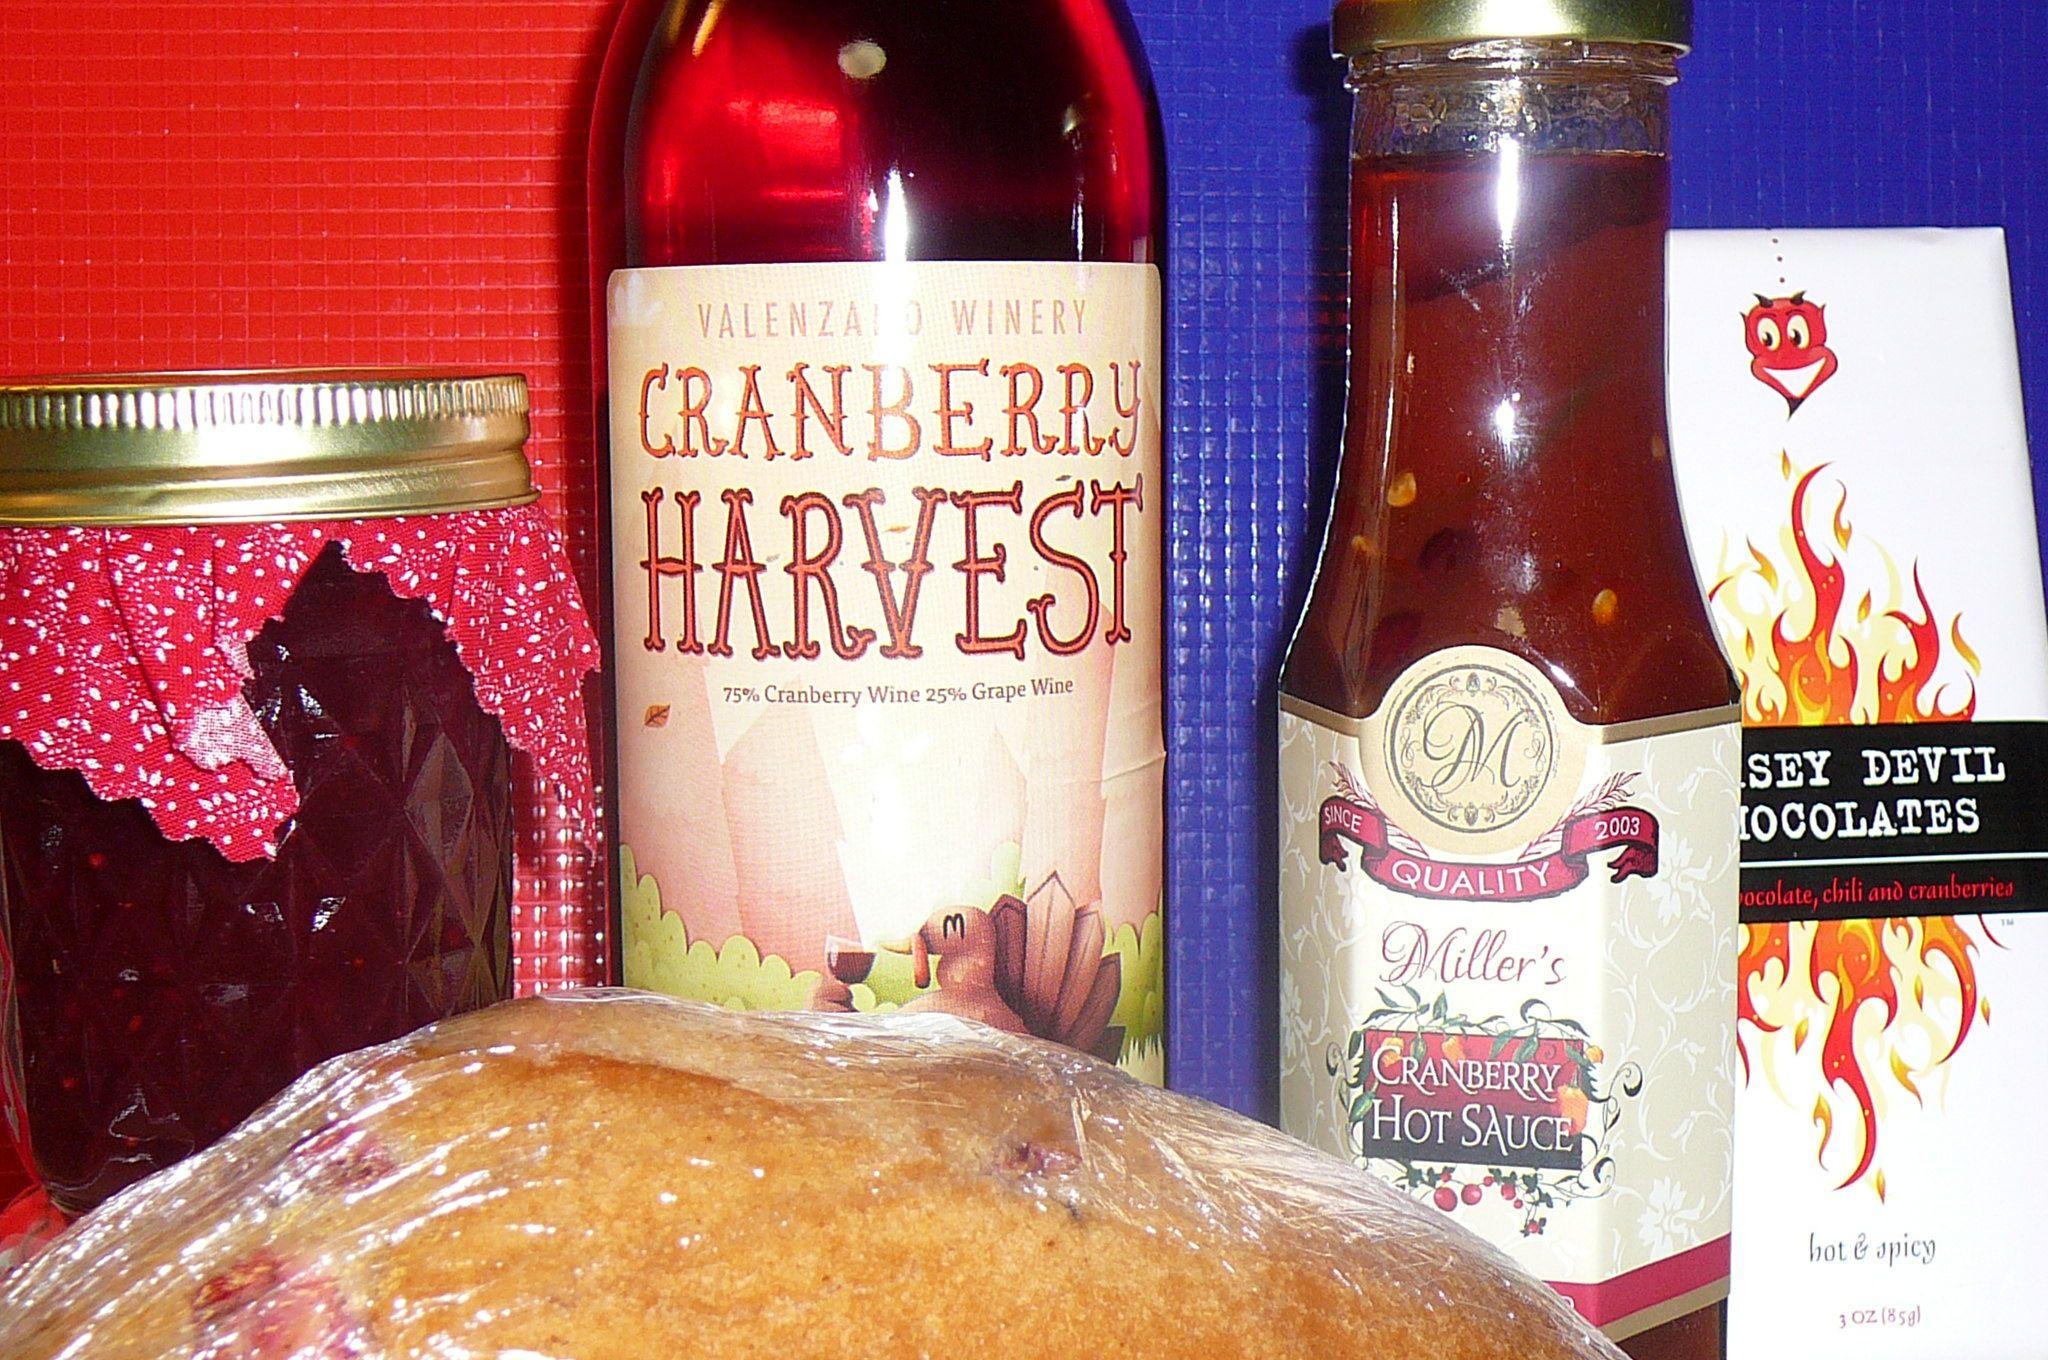 Chatsworth Cranberry Festival Treats Http Cranfest Org Chatsworth Cranberry Festival Welcome Html Cranberry Festival Cranberry Wine Cranberry